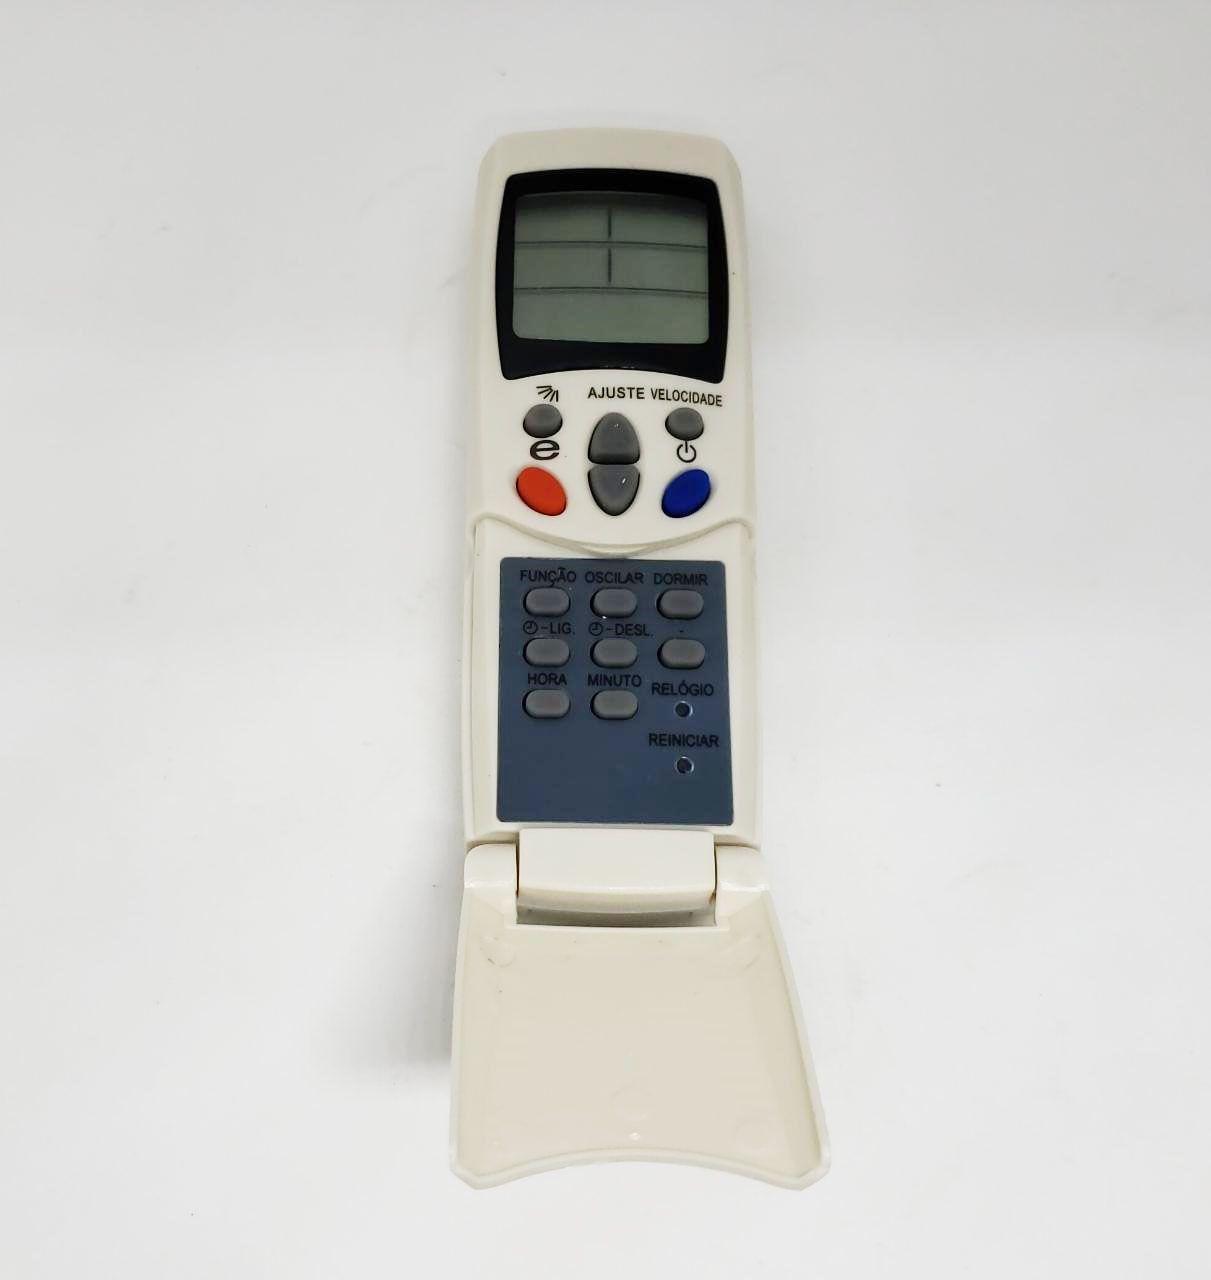 CONTROLE REMOTO ELGIN (CASSETE K7/PISO TETO) 18000 A 80000 BTU